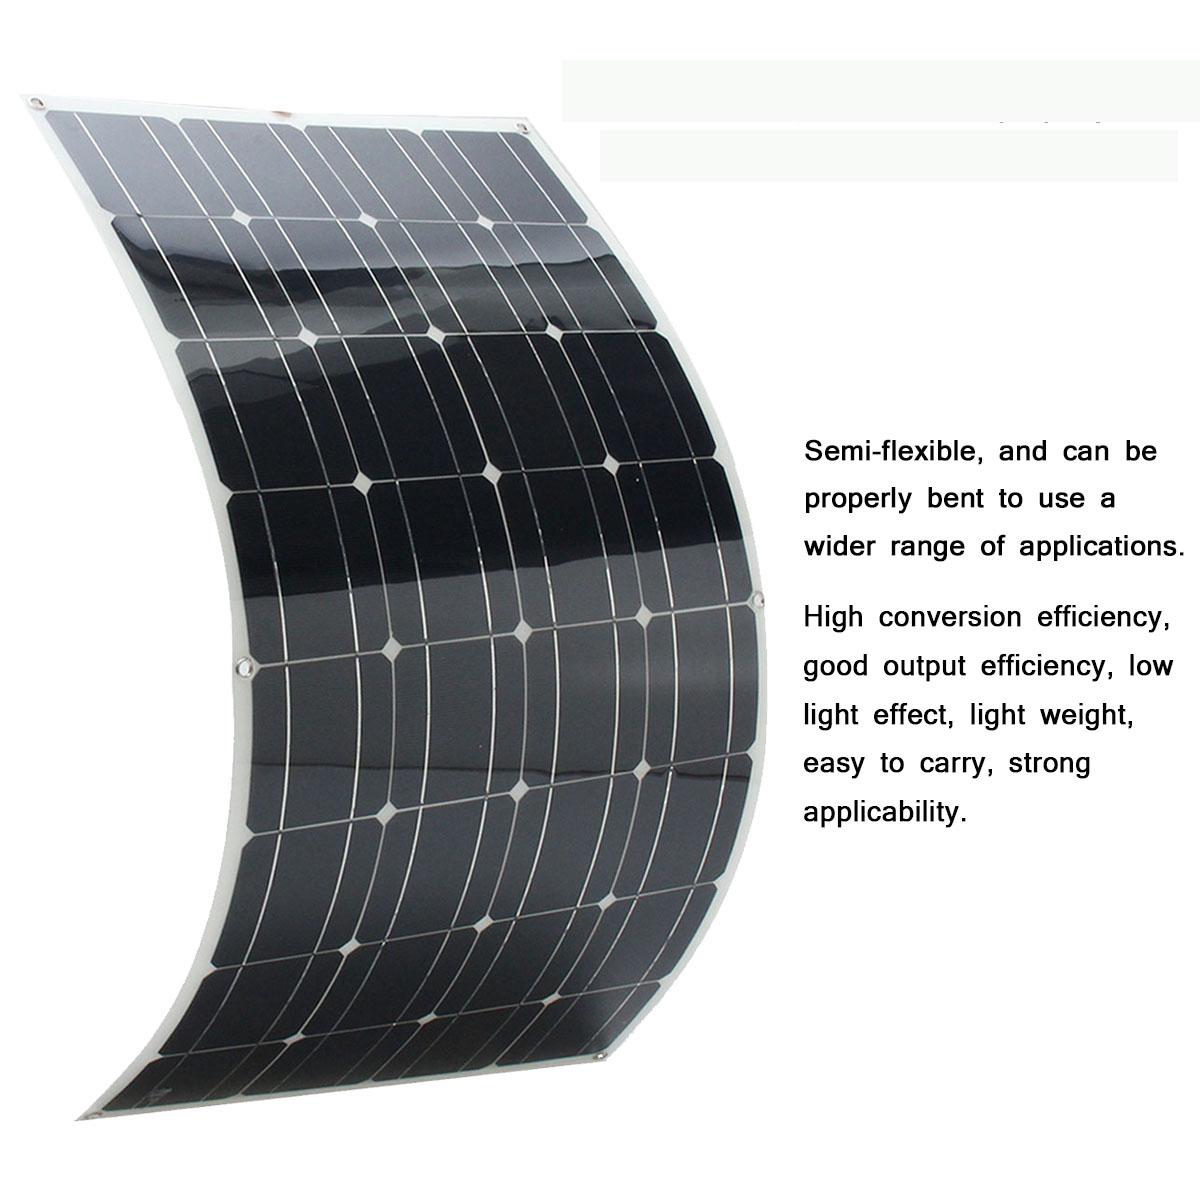 Elfeland Sp 38 18v 100w 1050x540x2 5mm Flexible Solar